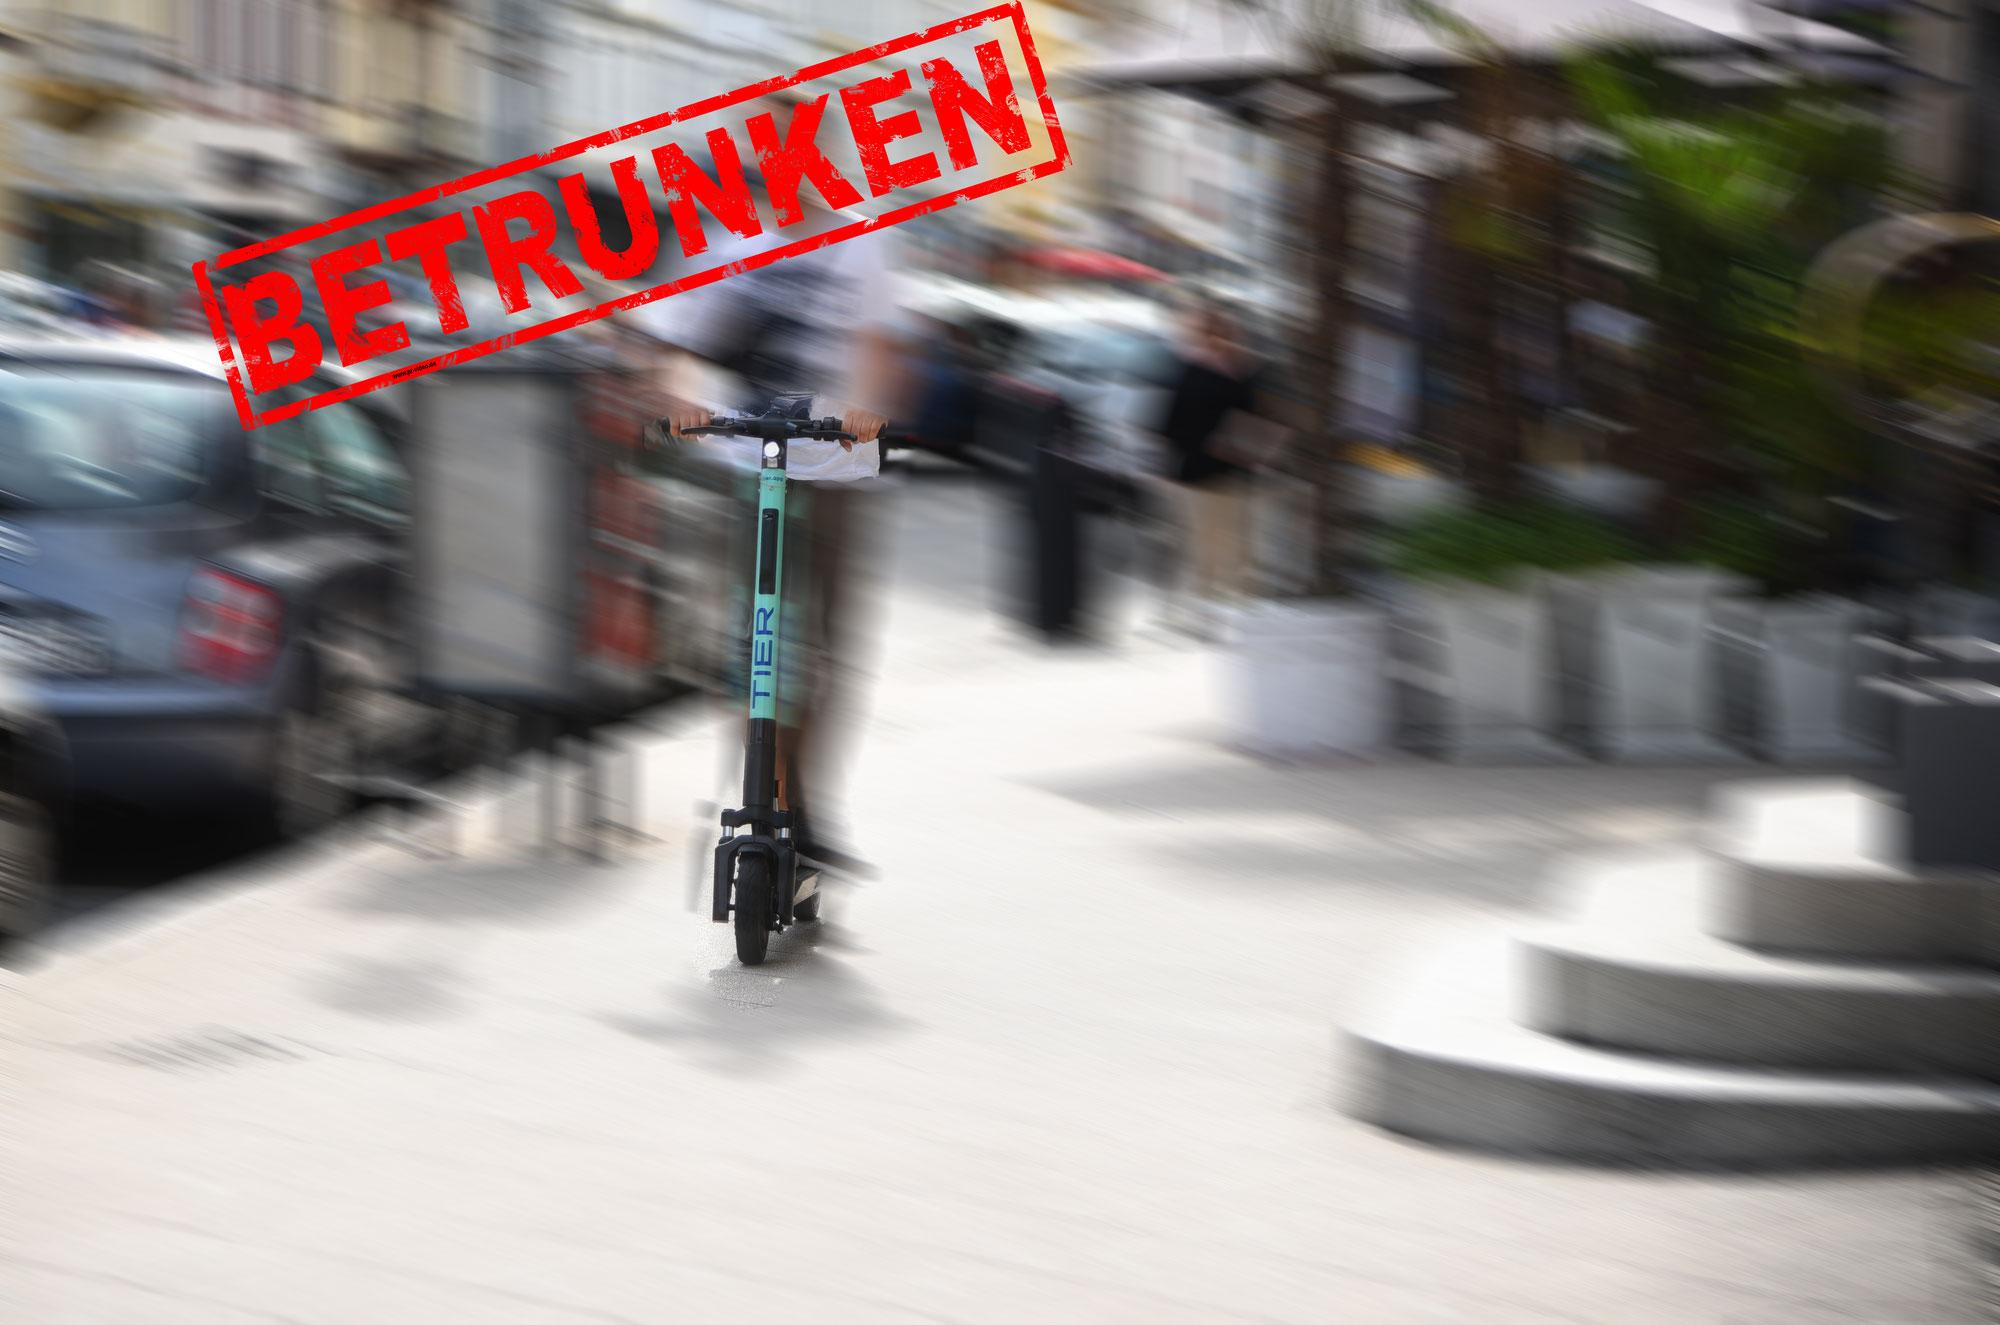 Heidelberg, Mannheim: Zwei schwere Unfälle - betrunkene E-Scooter Fahrer in Krankenhäusern